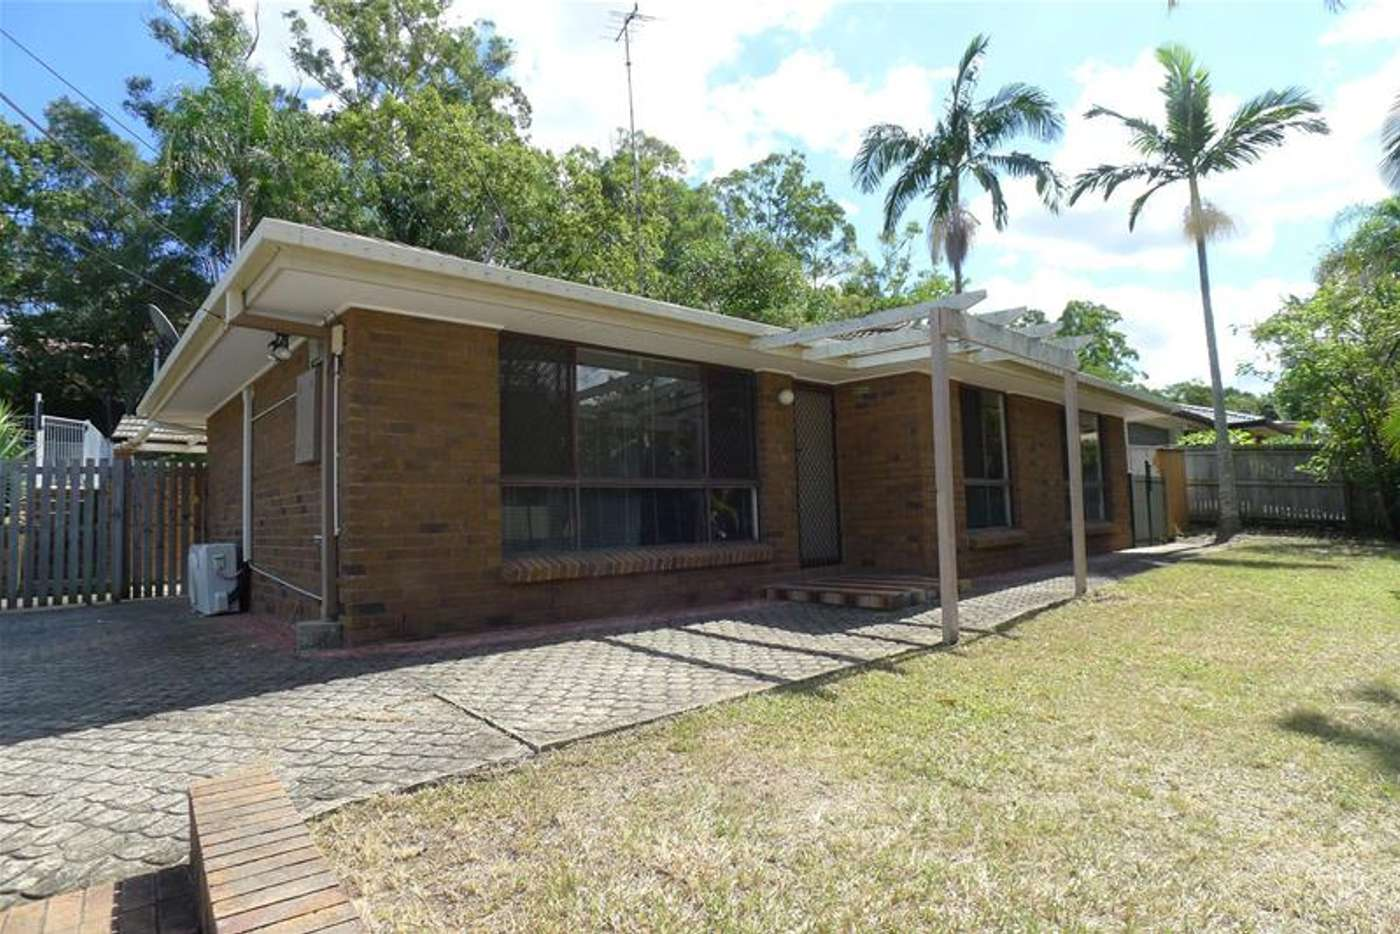 Main view of Homely house listing, 22 Bulwarna Street, Shailer Park QLD 4128